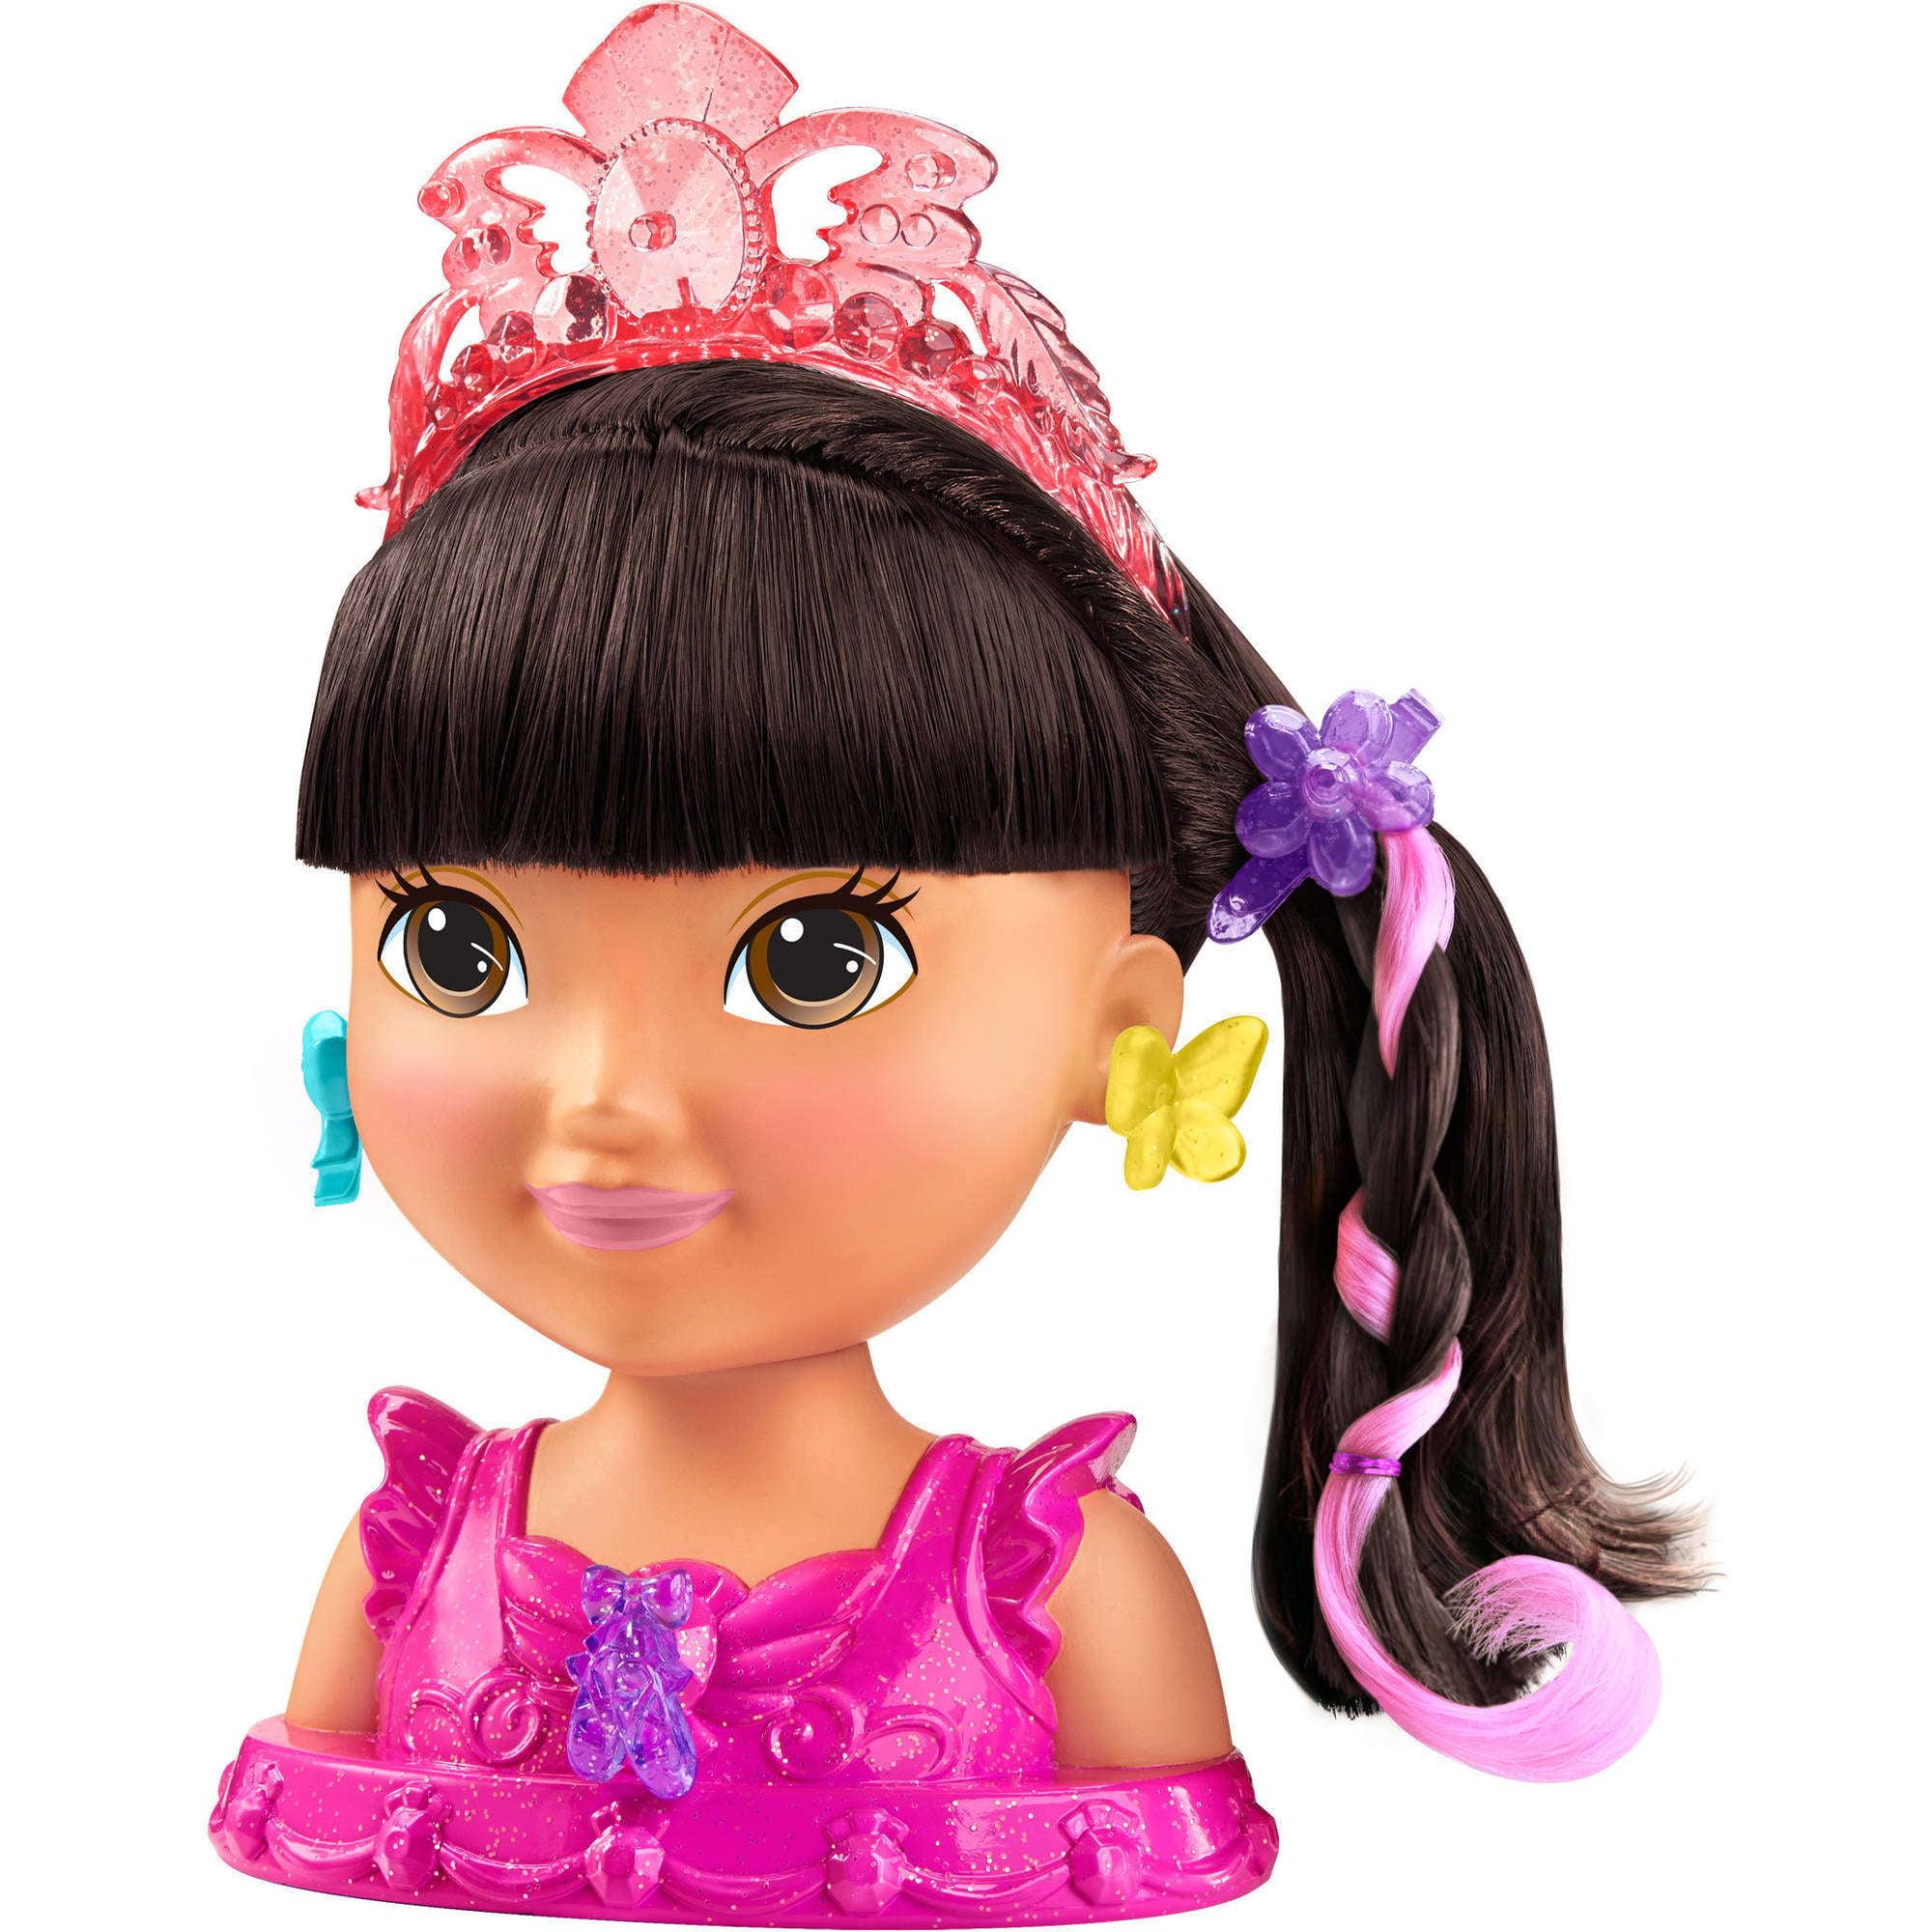 Nickelodeon Dora and Friends Ballerina Styling Head, Dora by Mattel